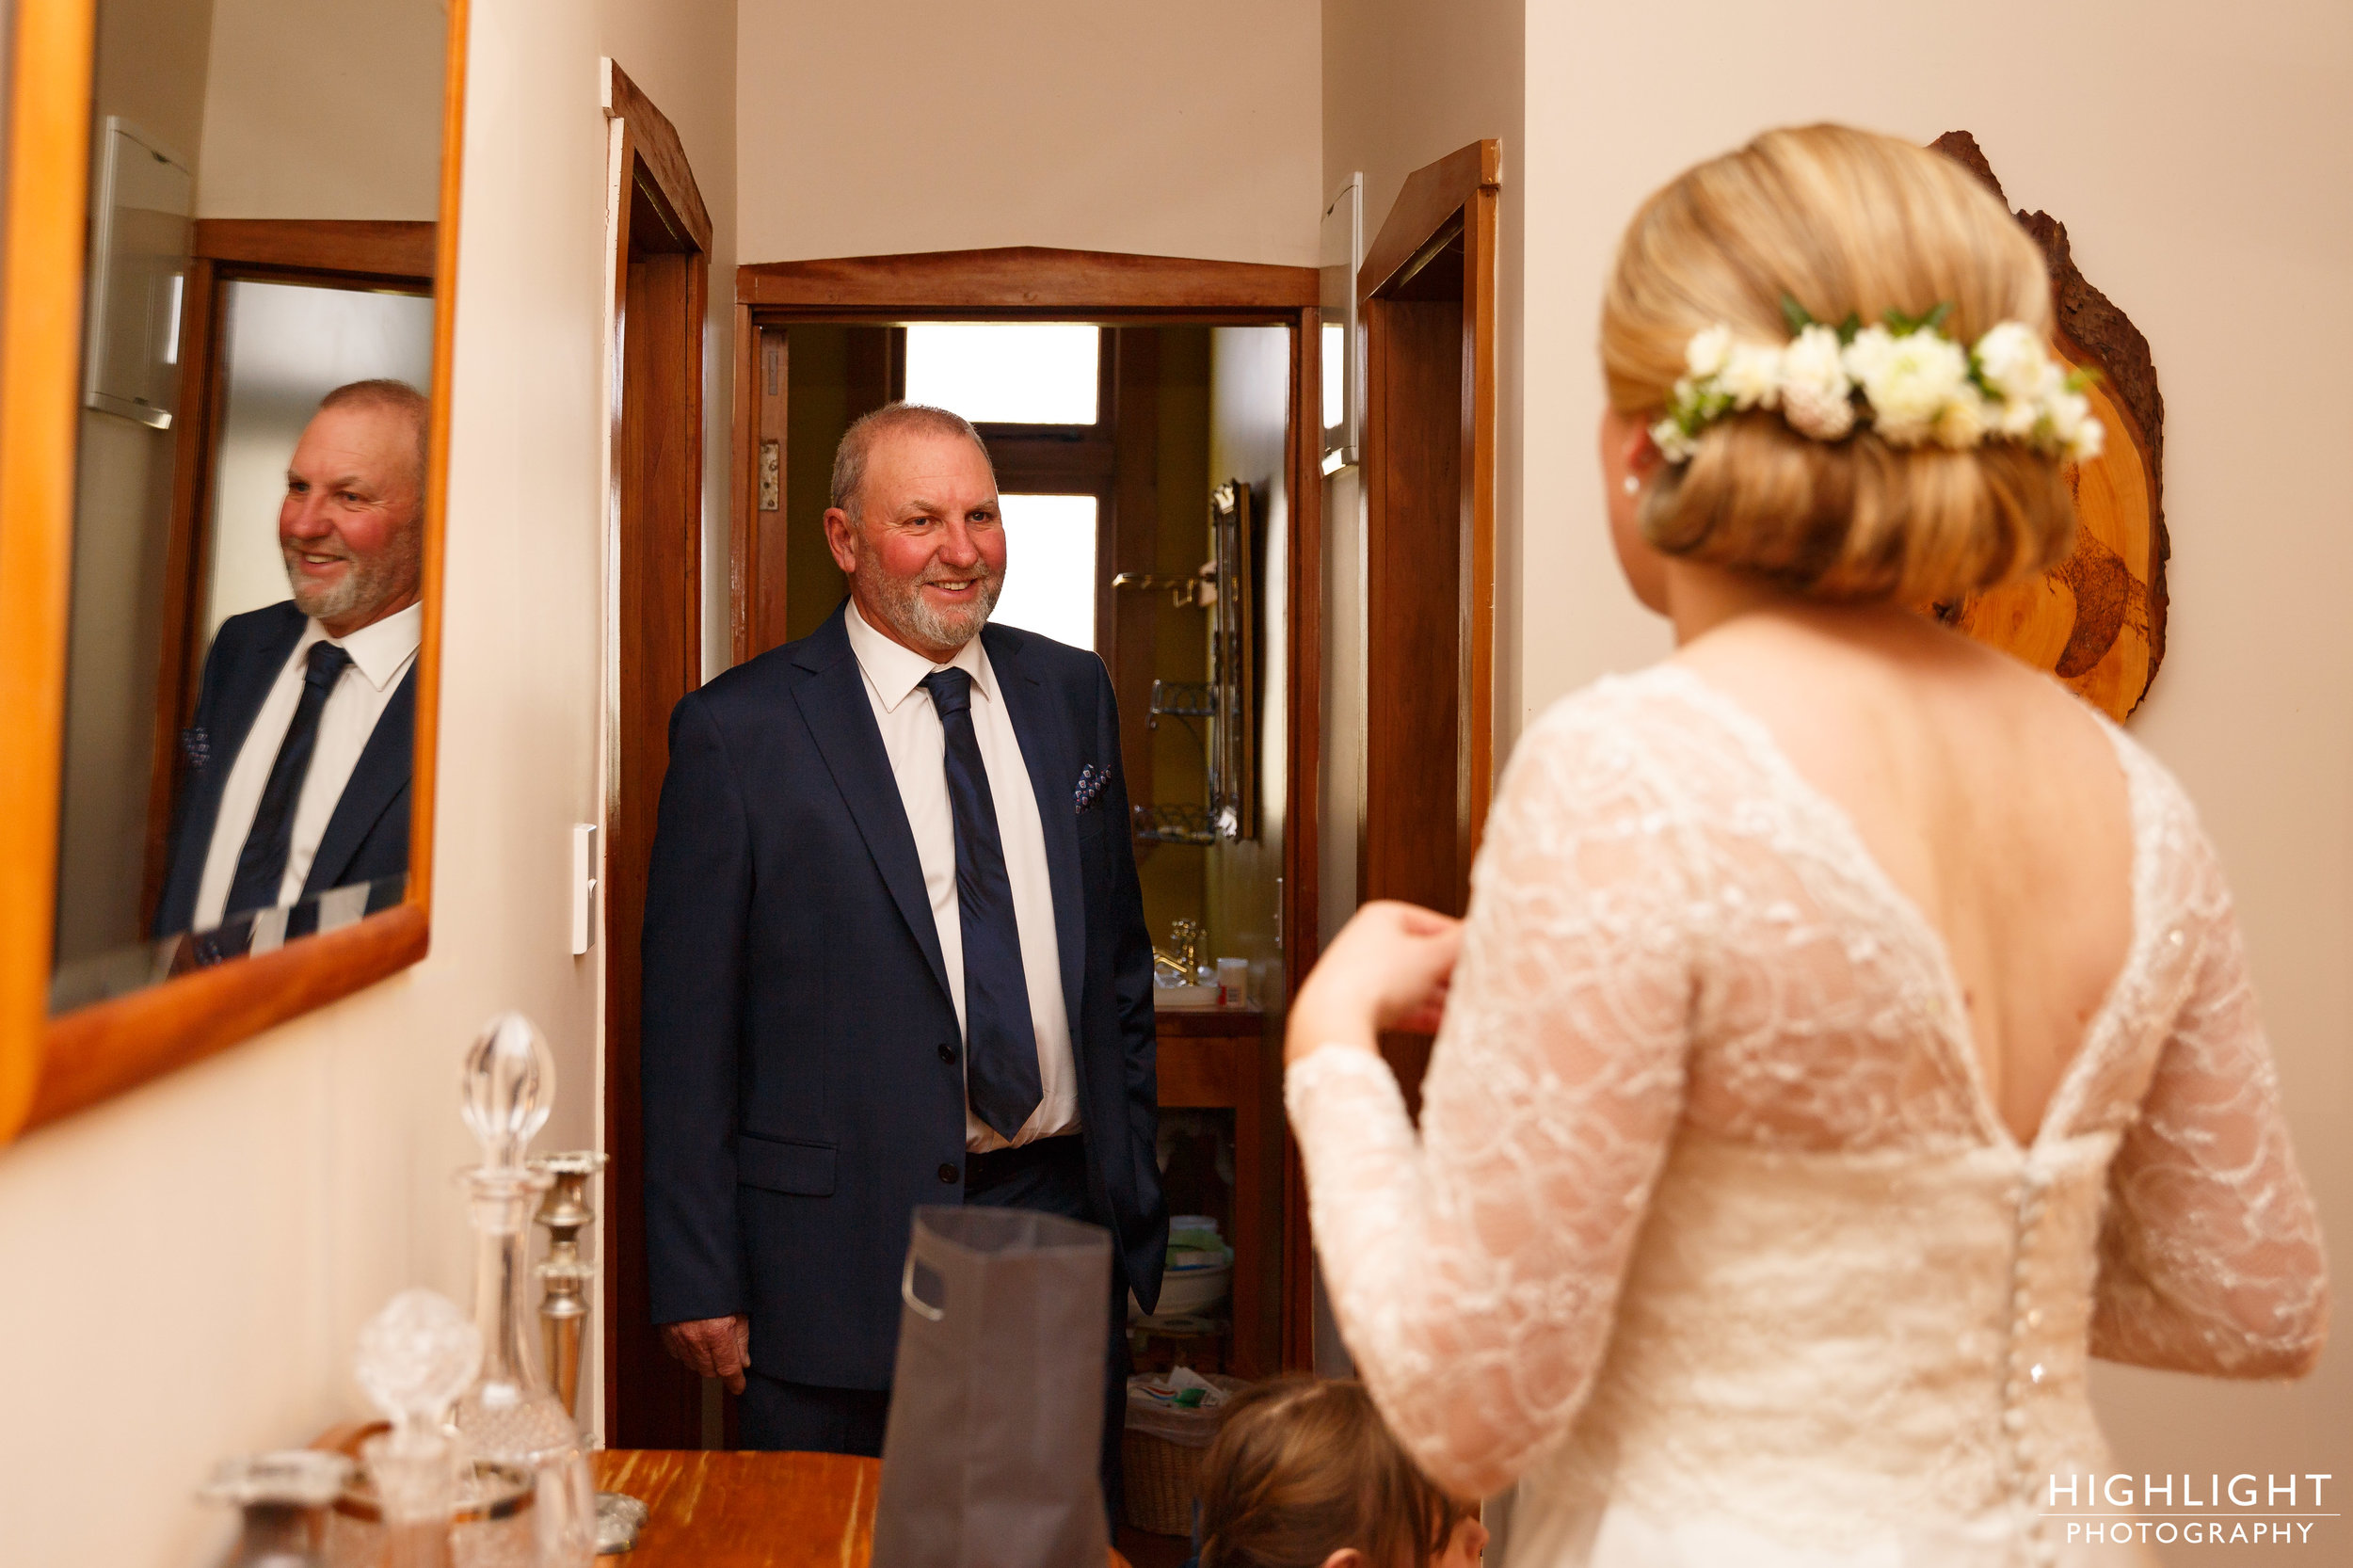 makoura-wedding-photography-highlight-new-zealand-12.jpg